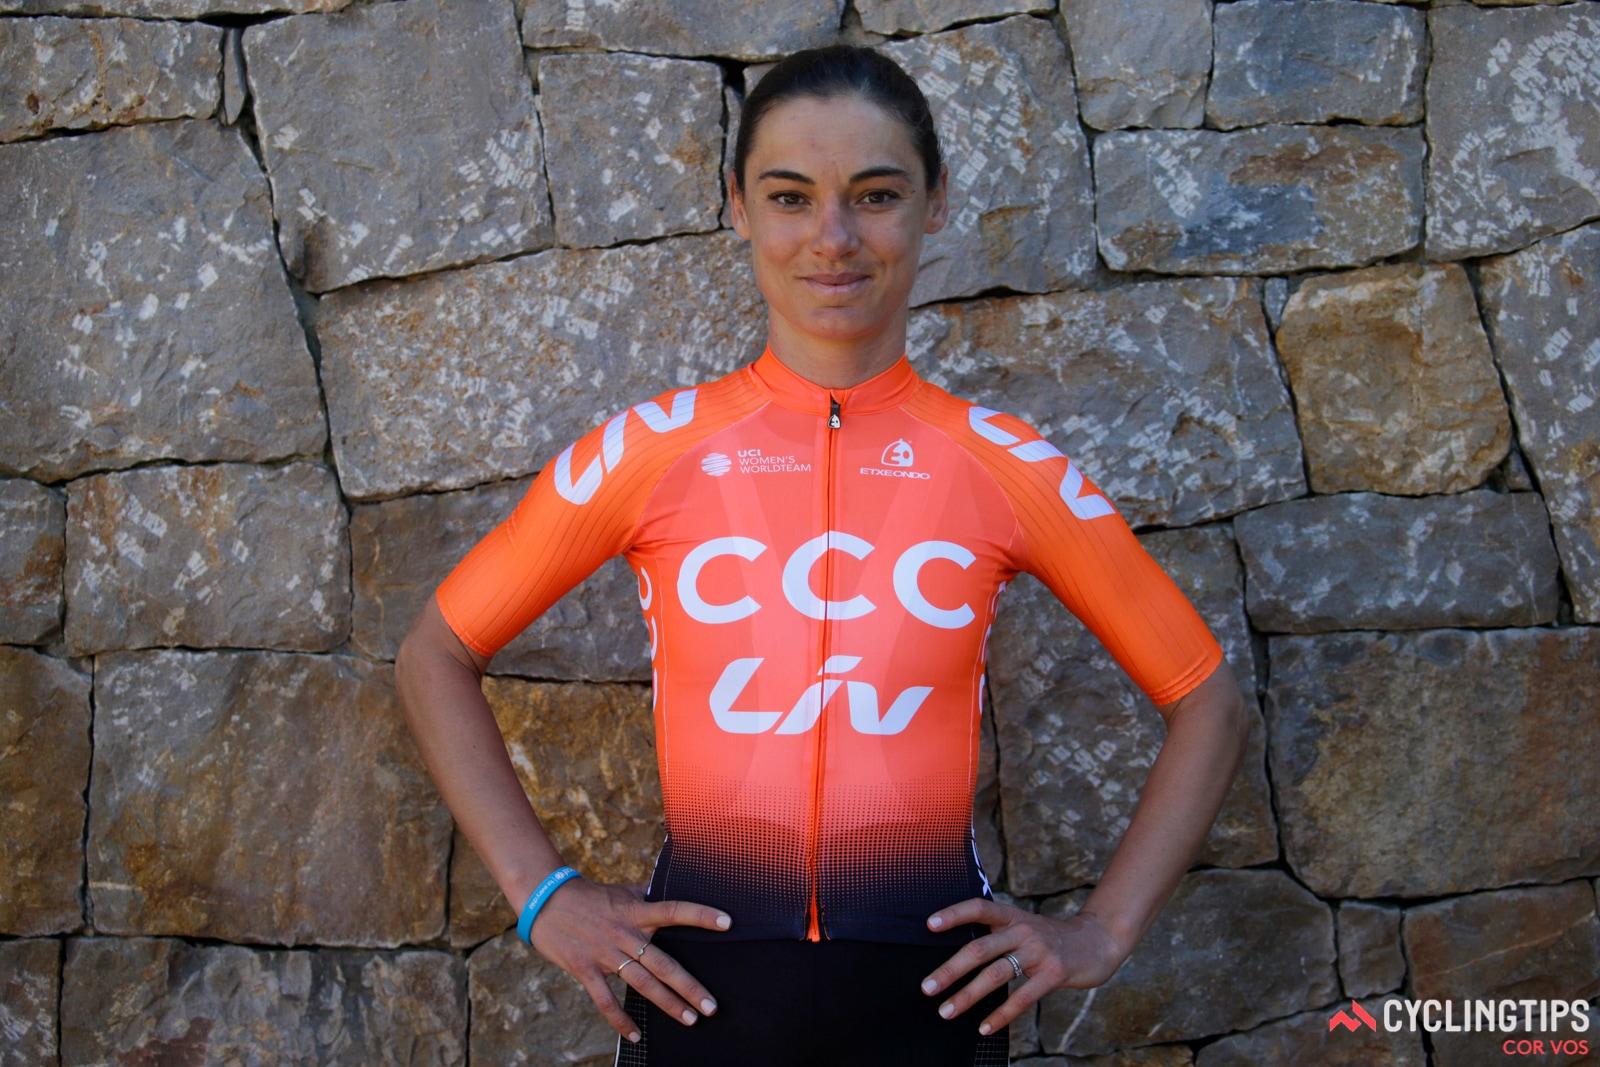 Ashleigh Moolman Pasio: 'Progress is not always comfortable'